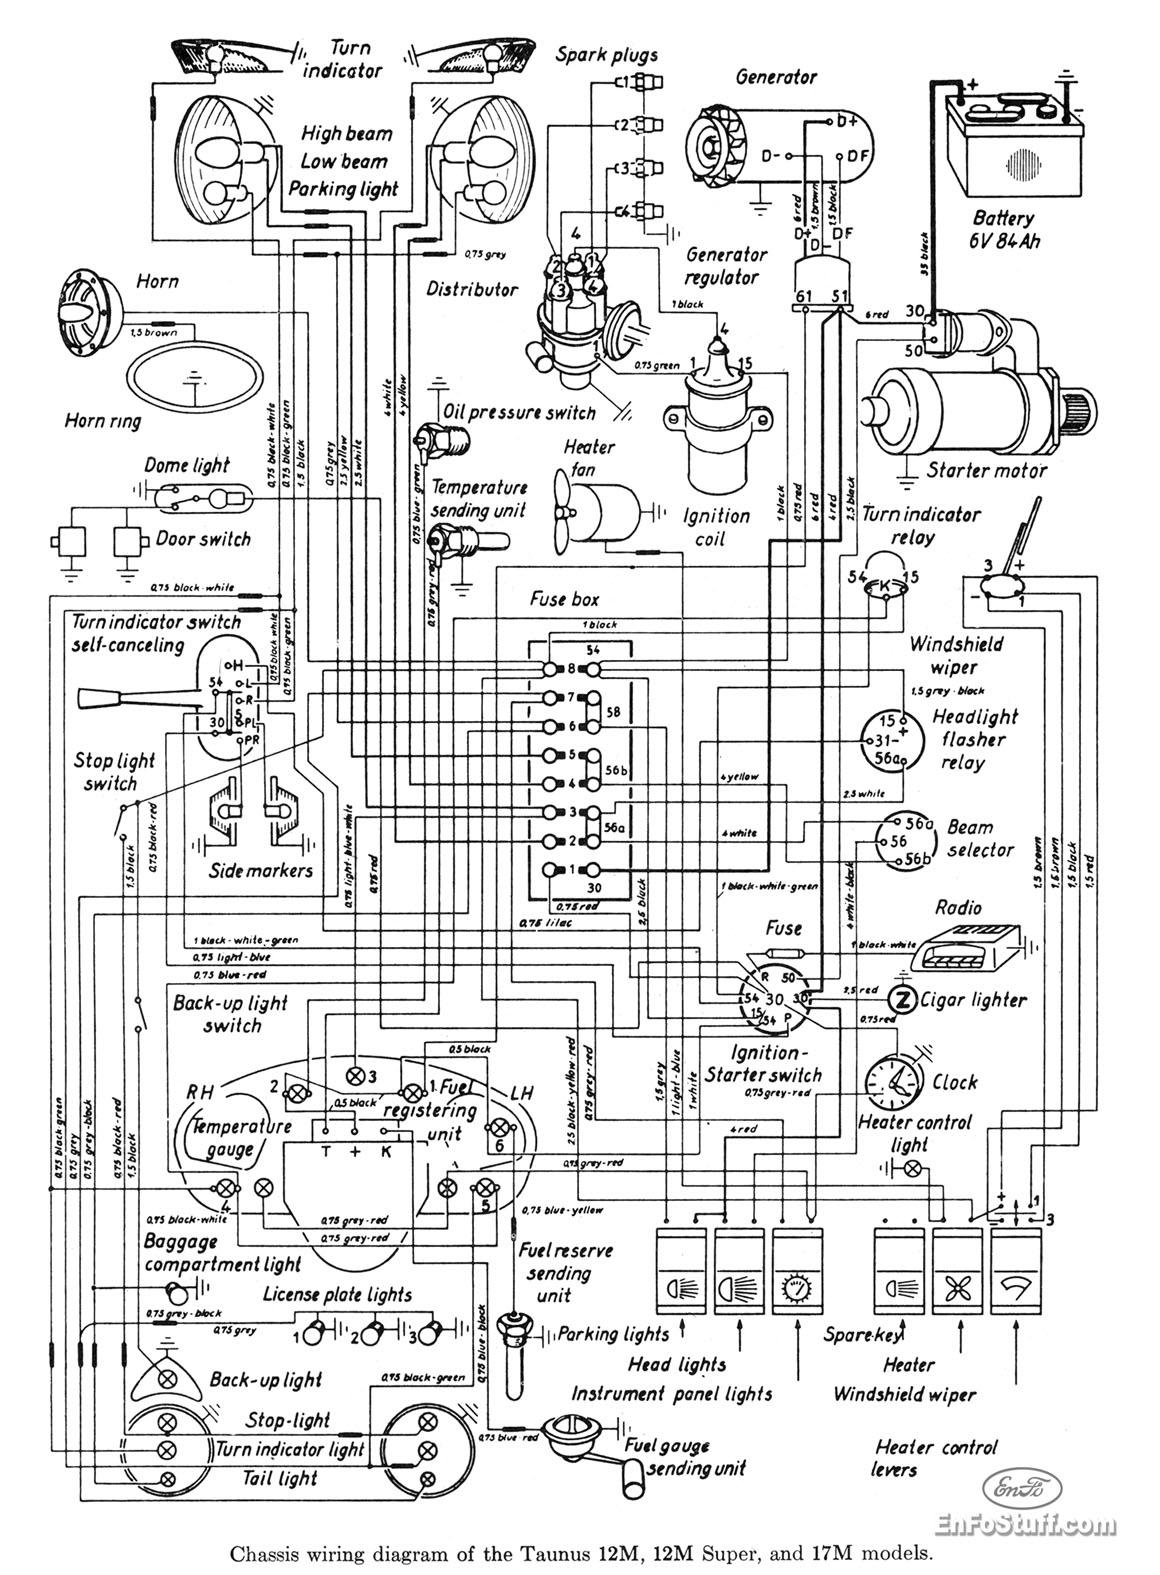 Wiring Diagram Wonderful Mitsubishi L200 Kenworth T600 Fuse Box Diagram